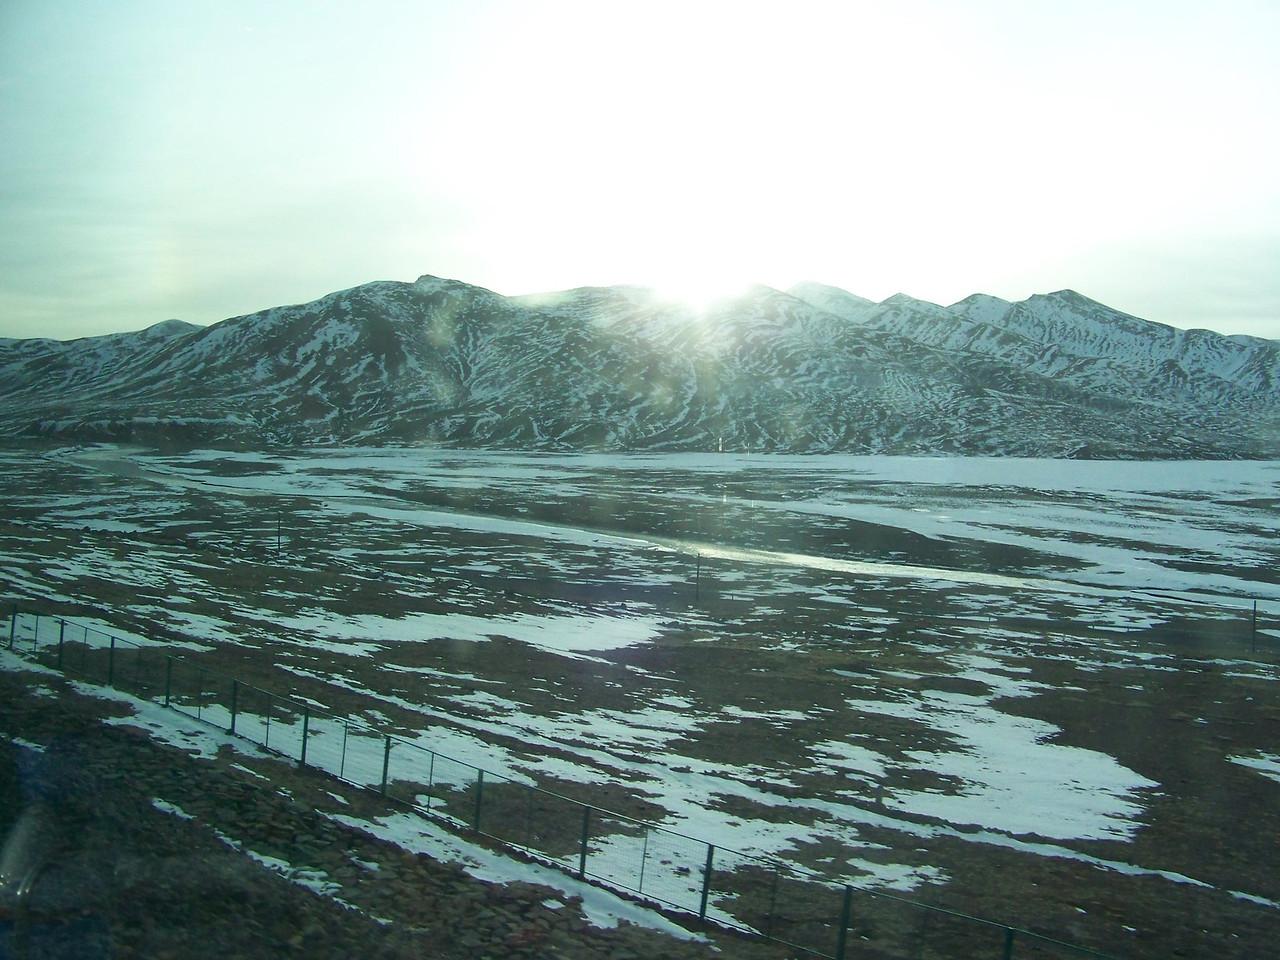 0097 - Scenery on Train Trip Between Beijing and Lhasa.JPG